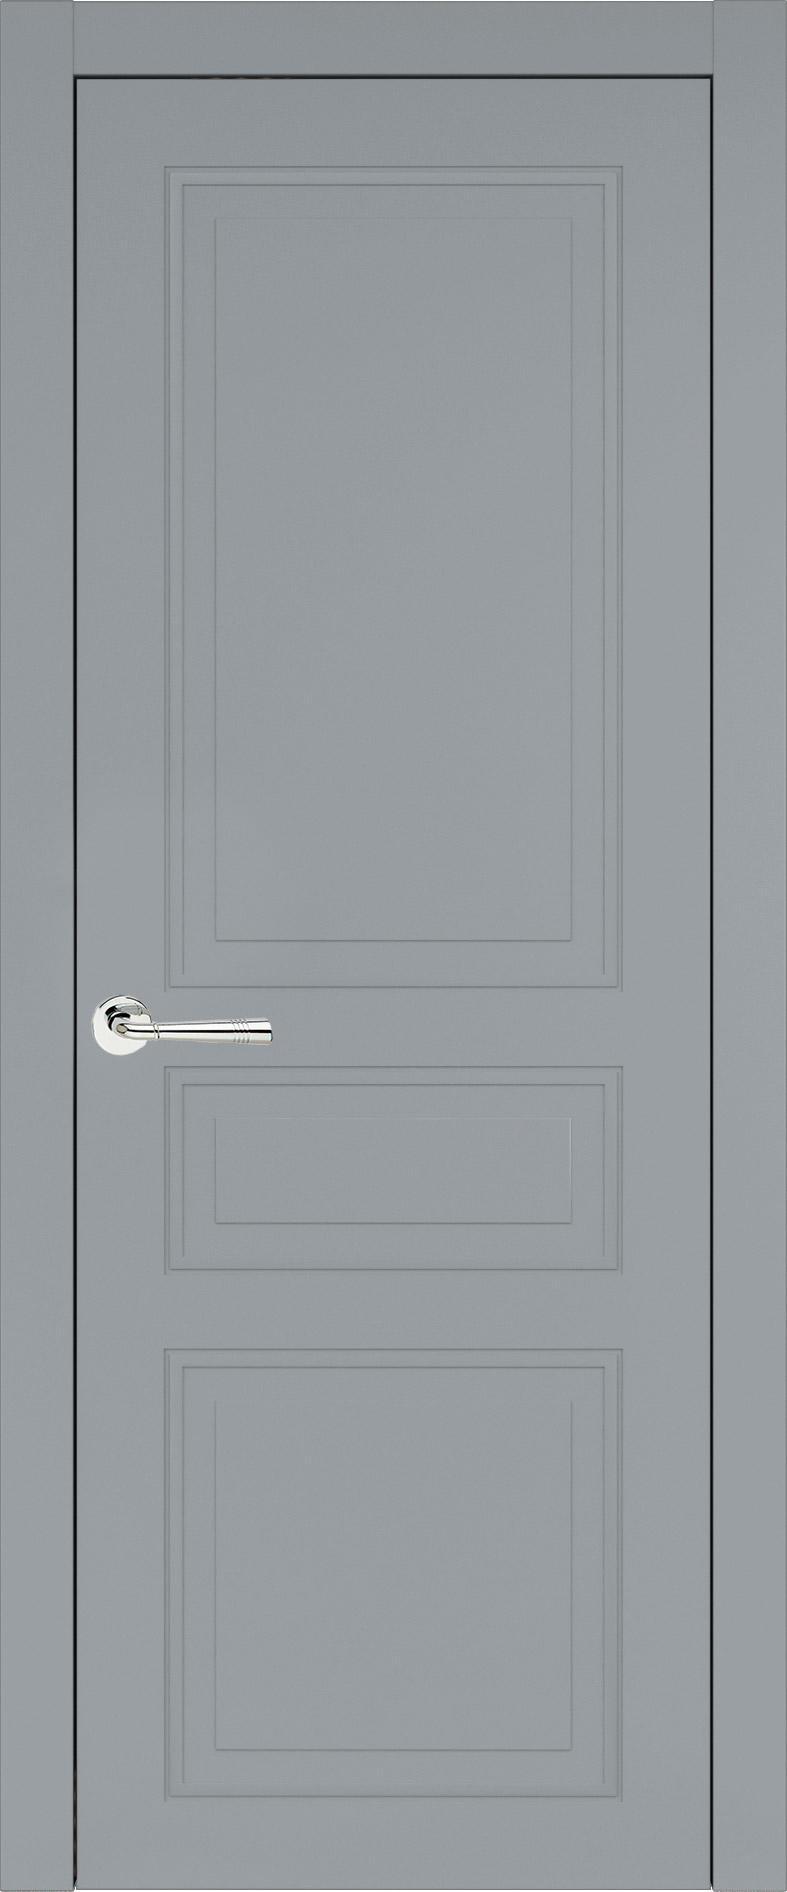 Imperia-R Neo Classic цвет - Серебристо-серая эмаль (RAL 7045) Без стекла (ДГ)